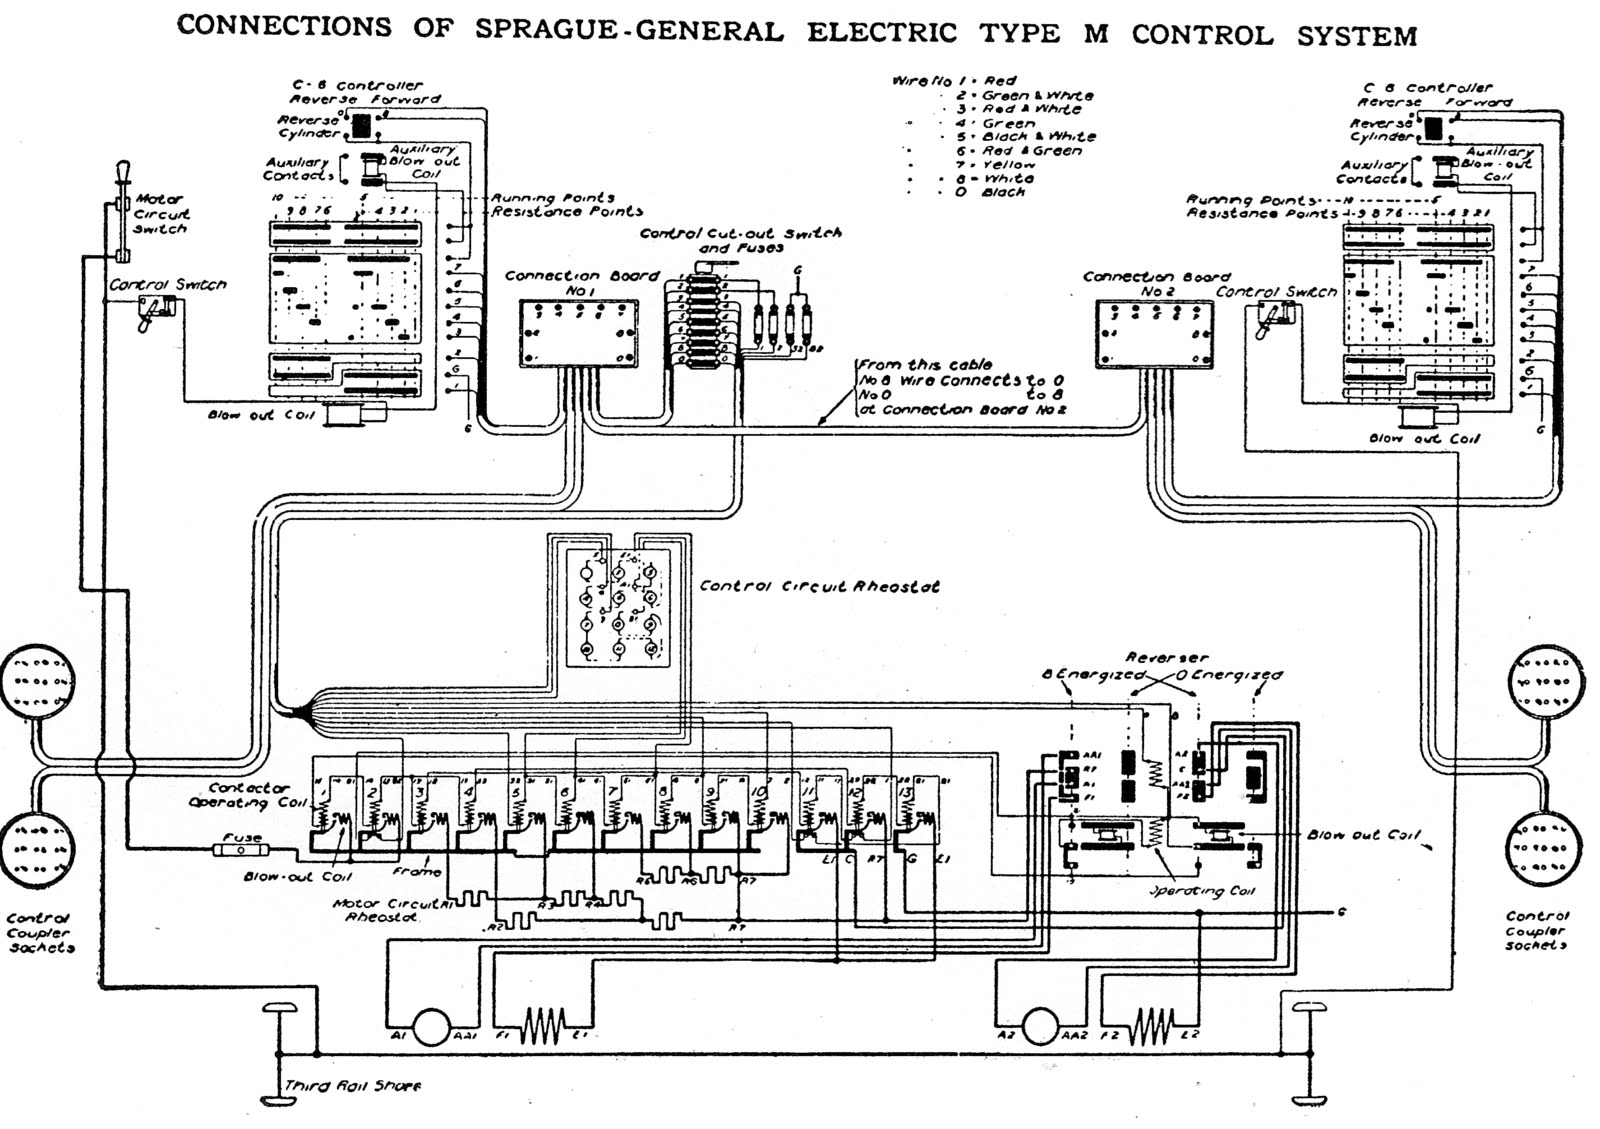 bobcat 642 fuel tank diagram best wiring library Motorcycle Inspection Diagram 2008 bobcat wiring diagram wiring diagrams 2008 mustang wiring diagram 2008 bobcat wiring diagram